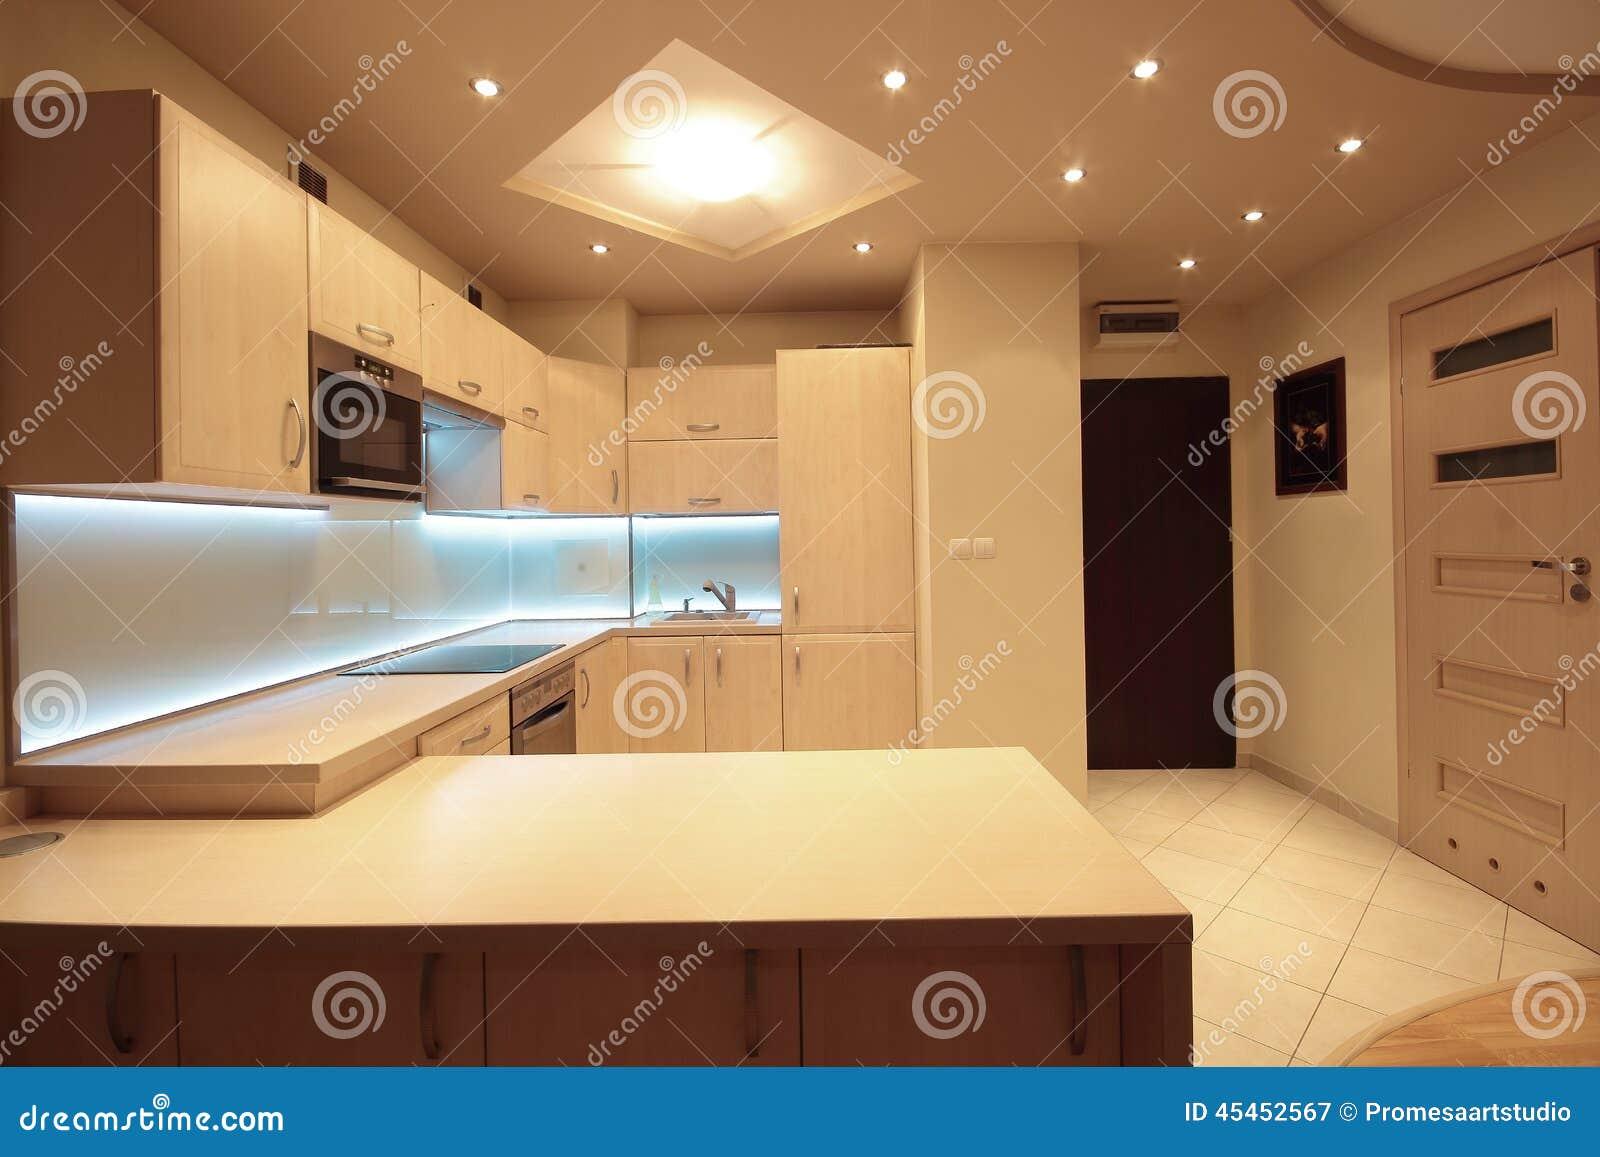 stock photo modern luxury kitchen white led lighting image kitchen led lighting Modern luxury kitchen with white LED lighting